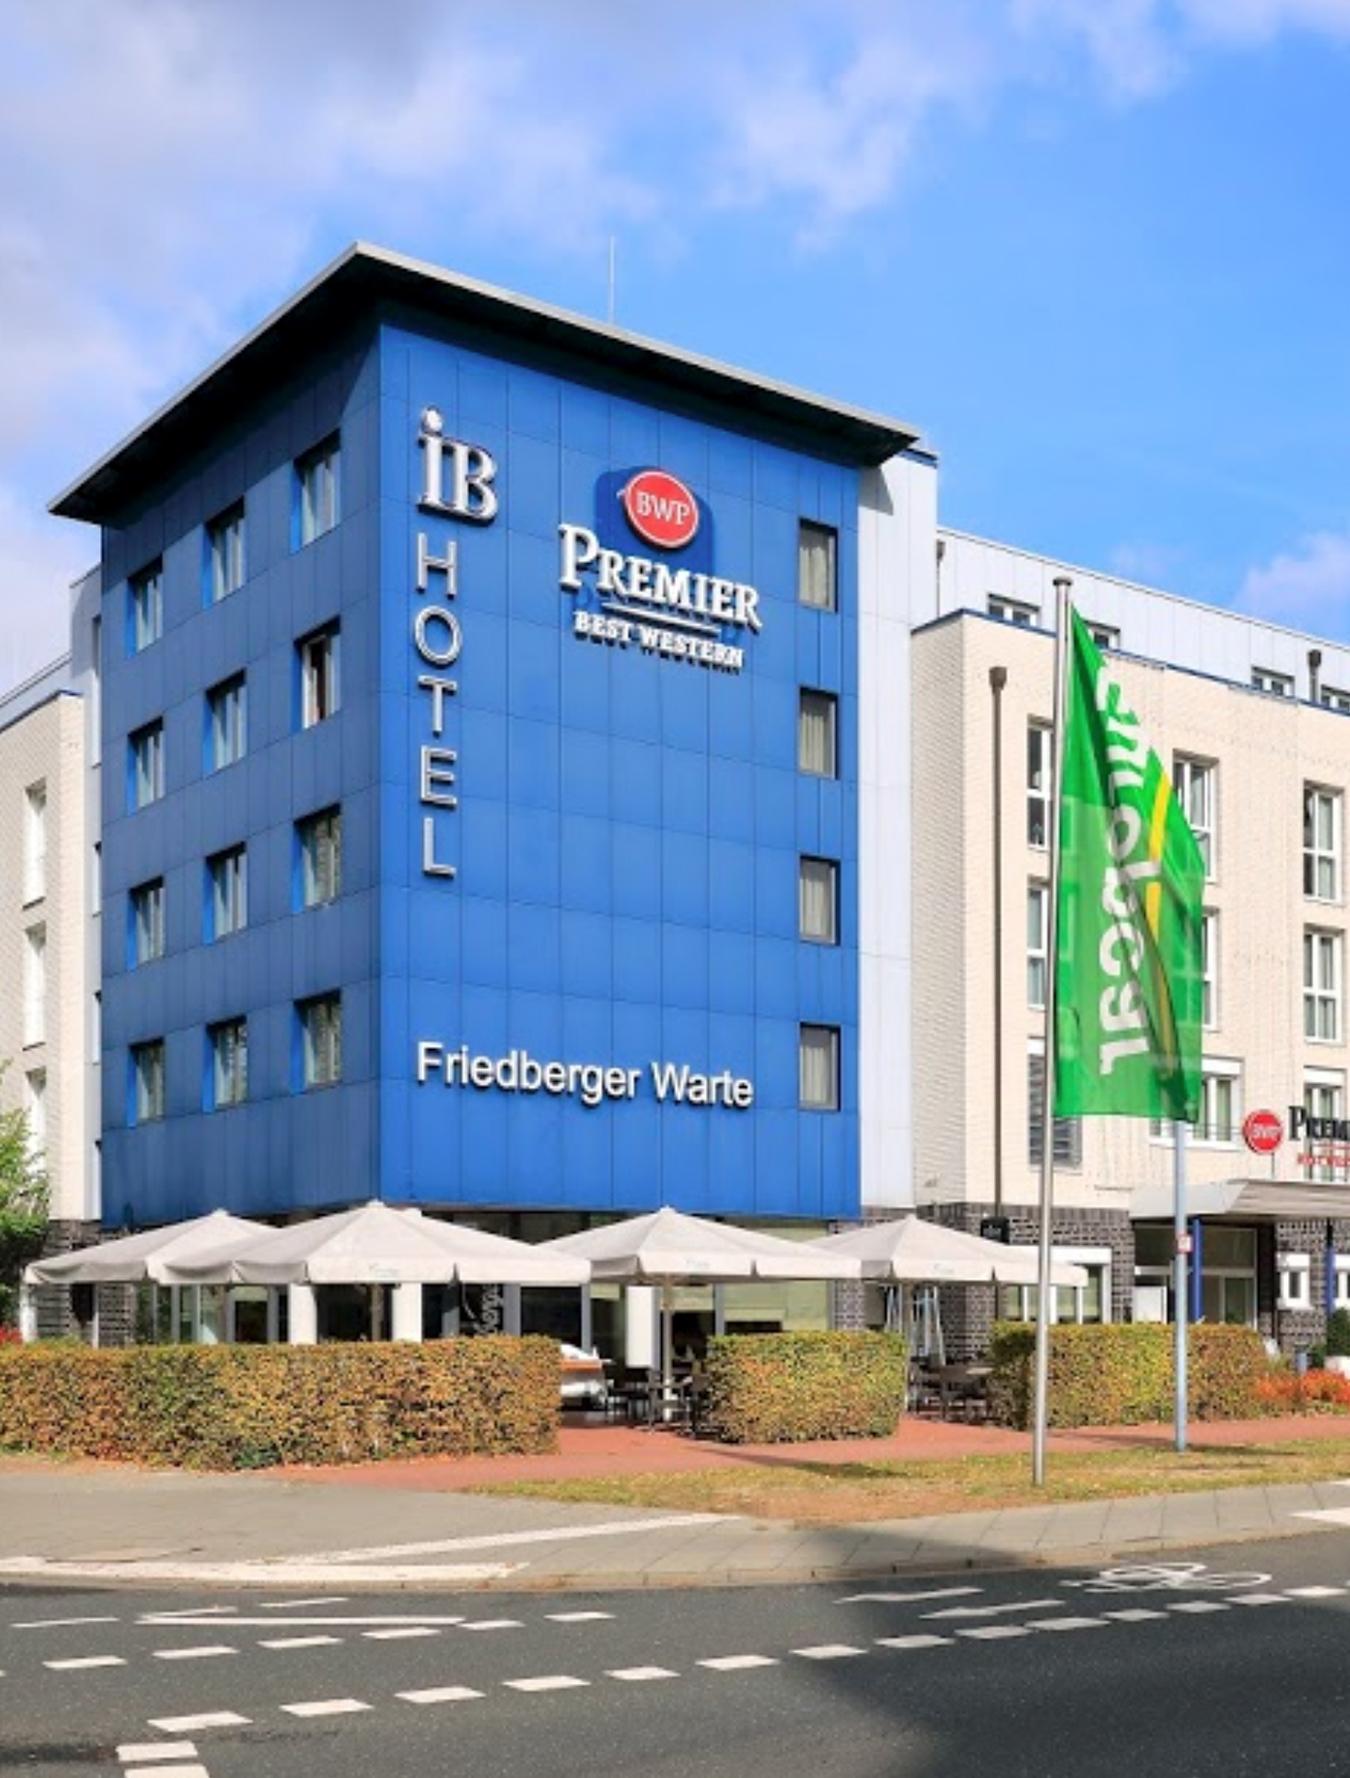 Frankfurt - IB Hotel Friedberger Warte